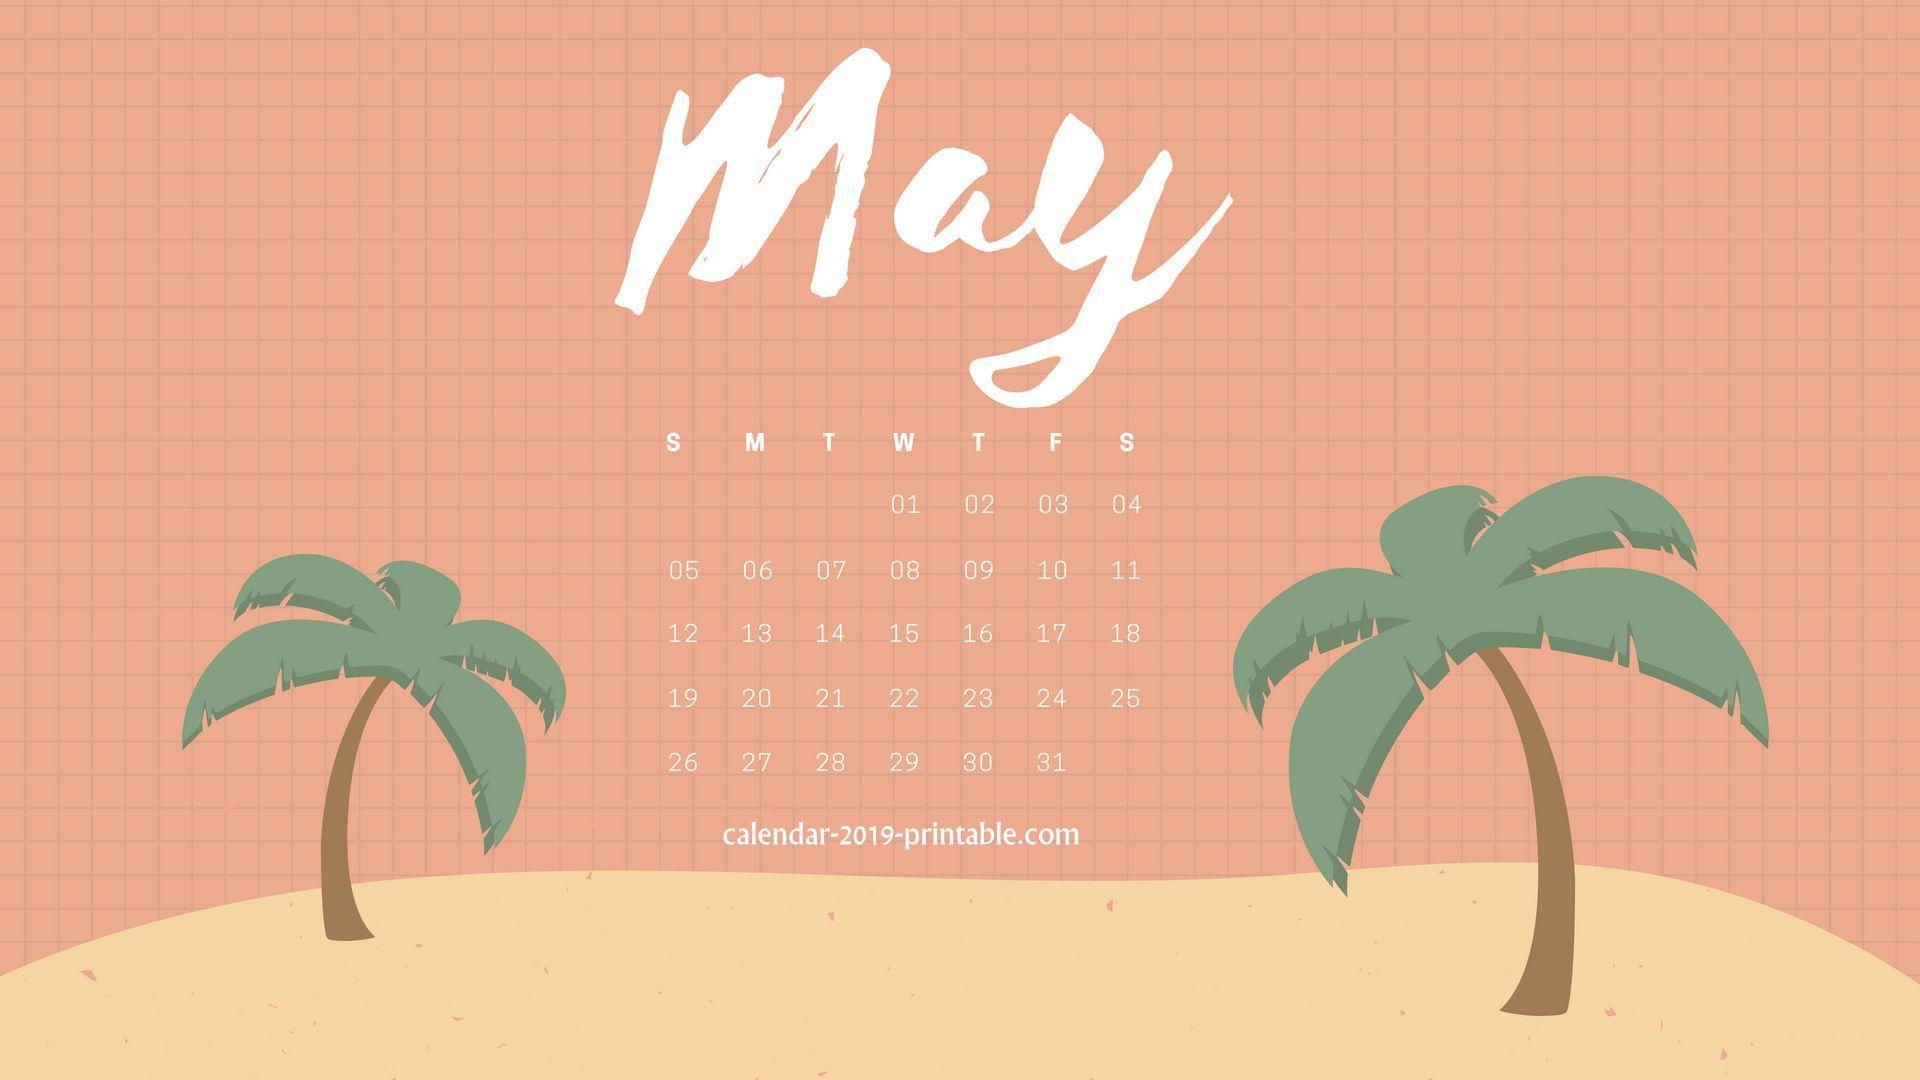 may 2019 calendar wallpaper Calendar 2019 Wallpapers in 2019 1920x1080